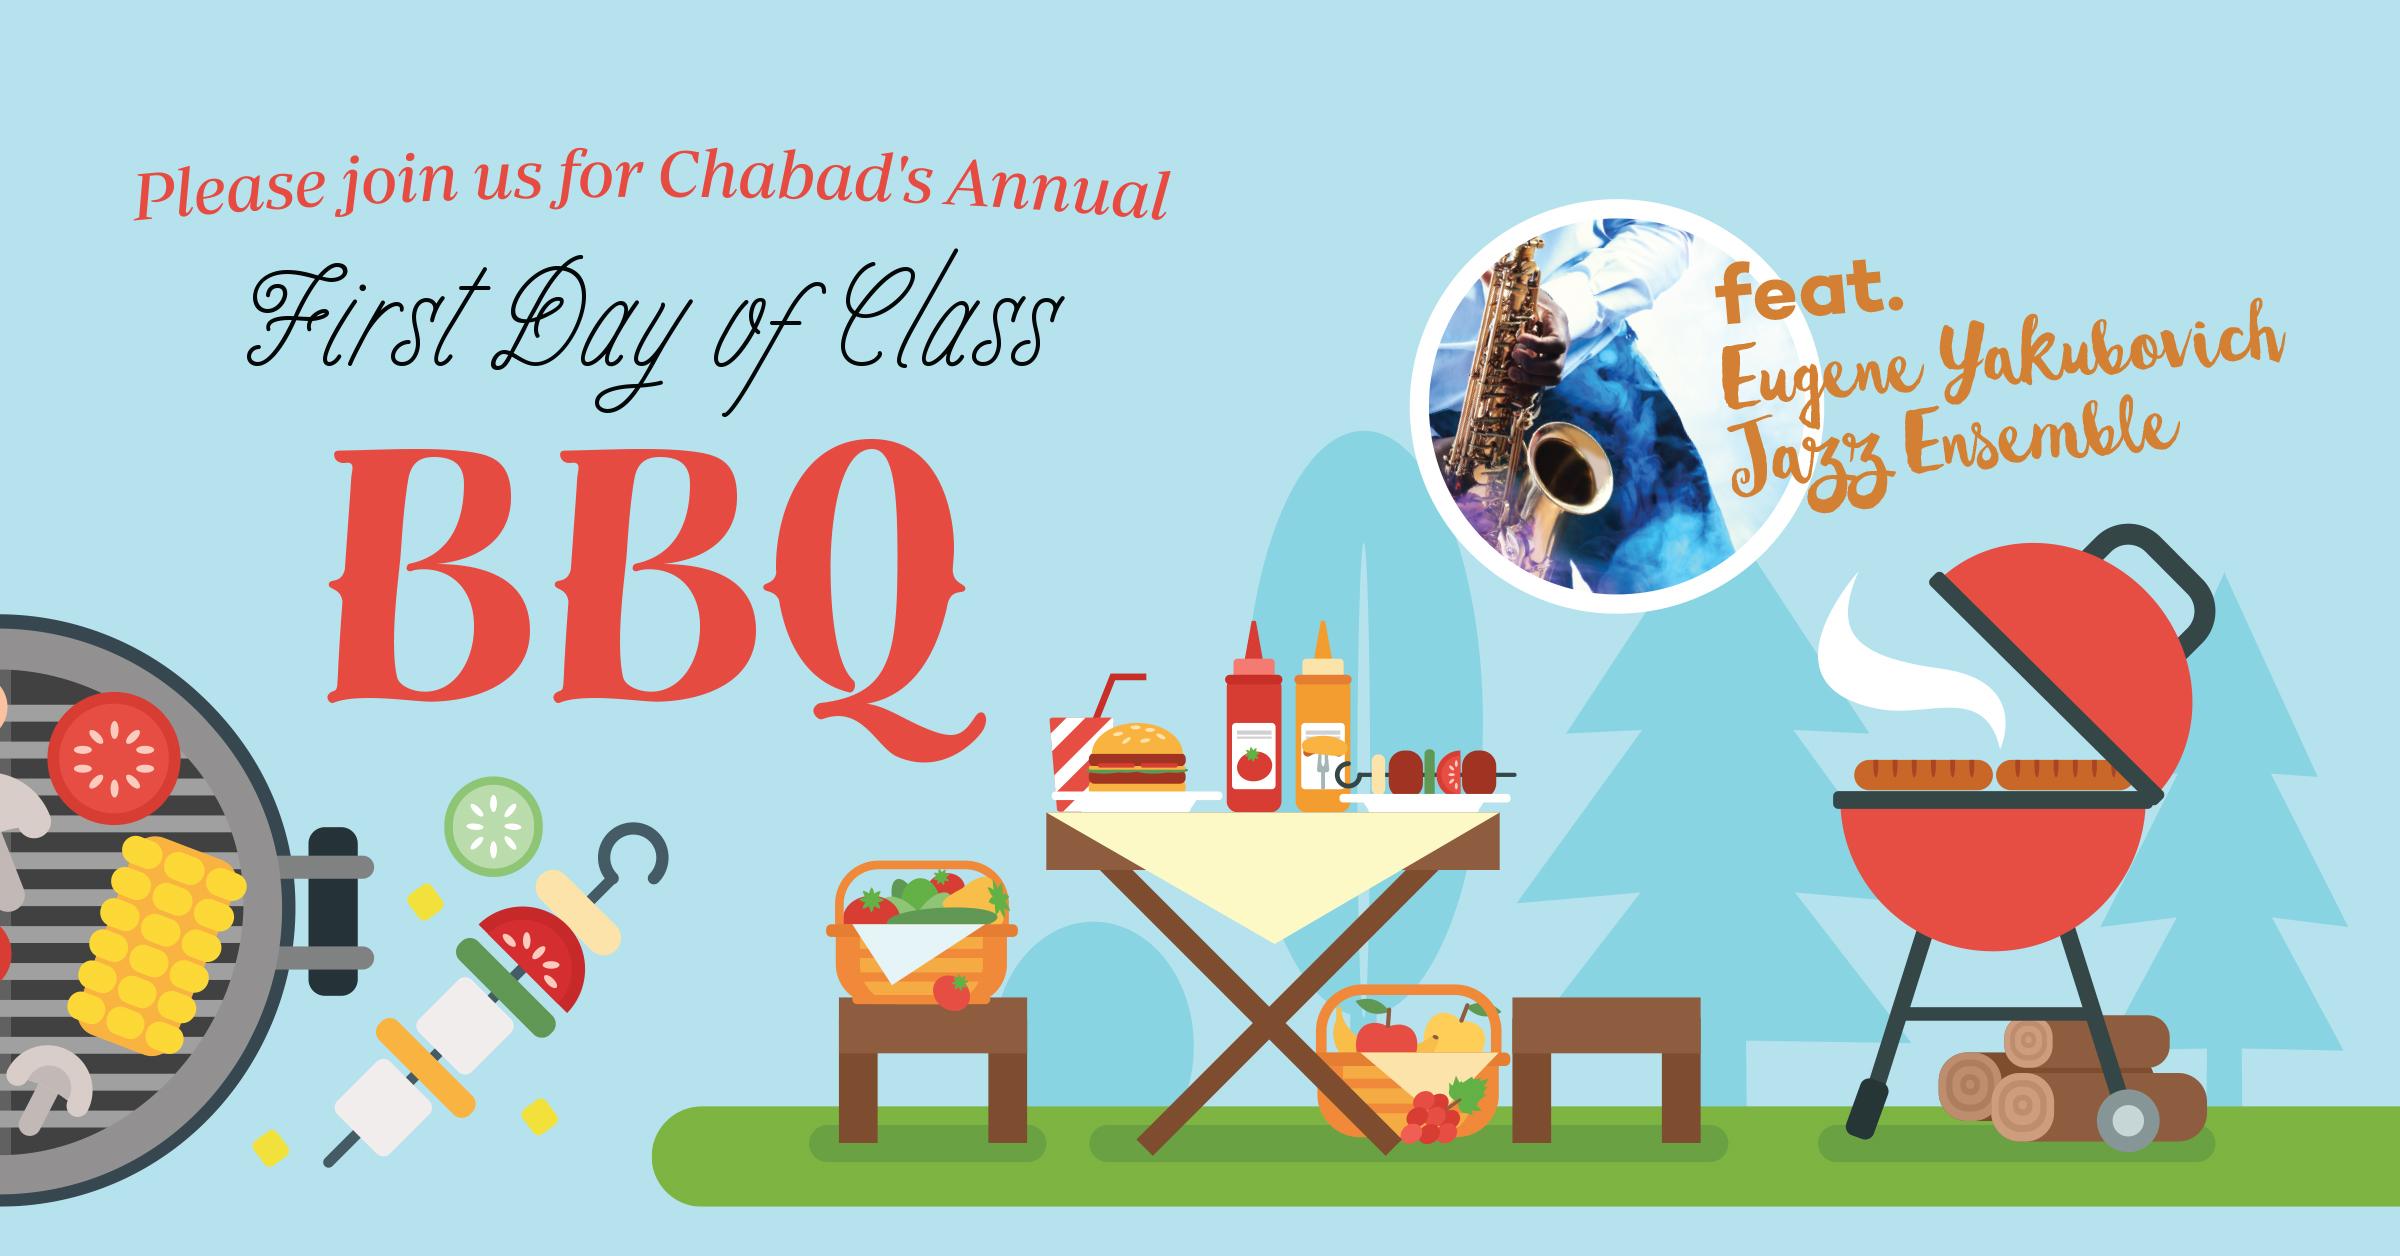 BBQ-Event-Image.jpg